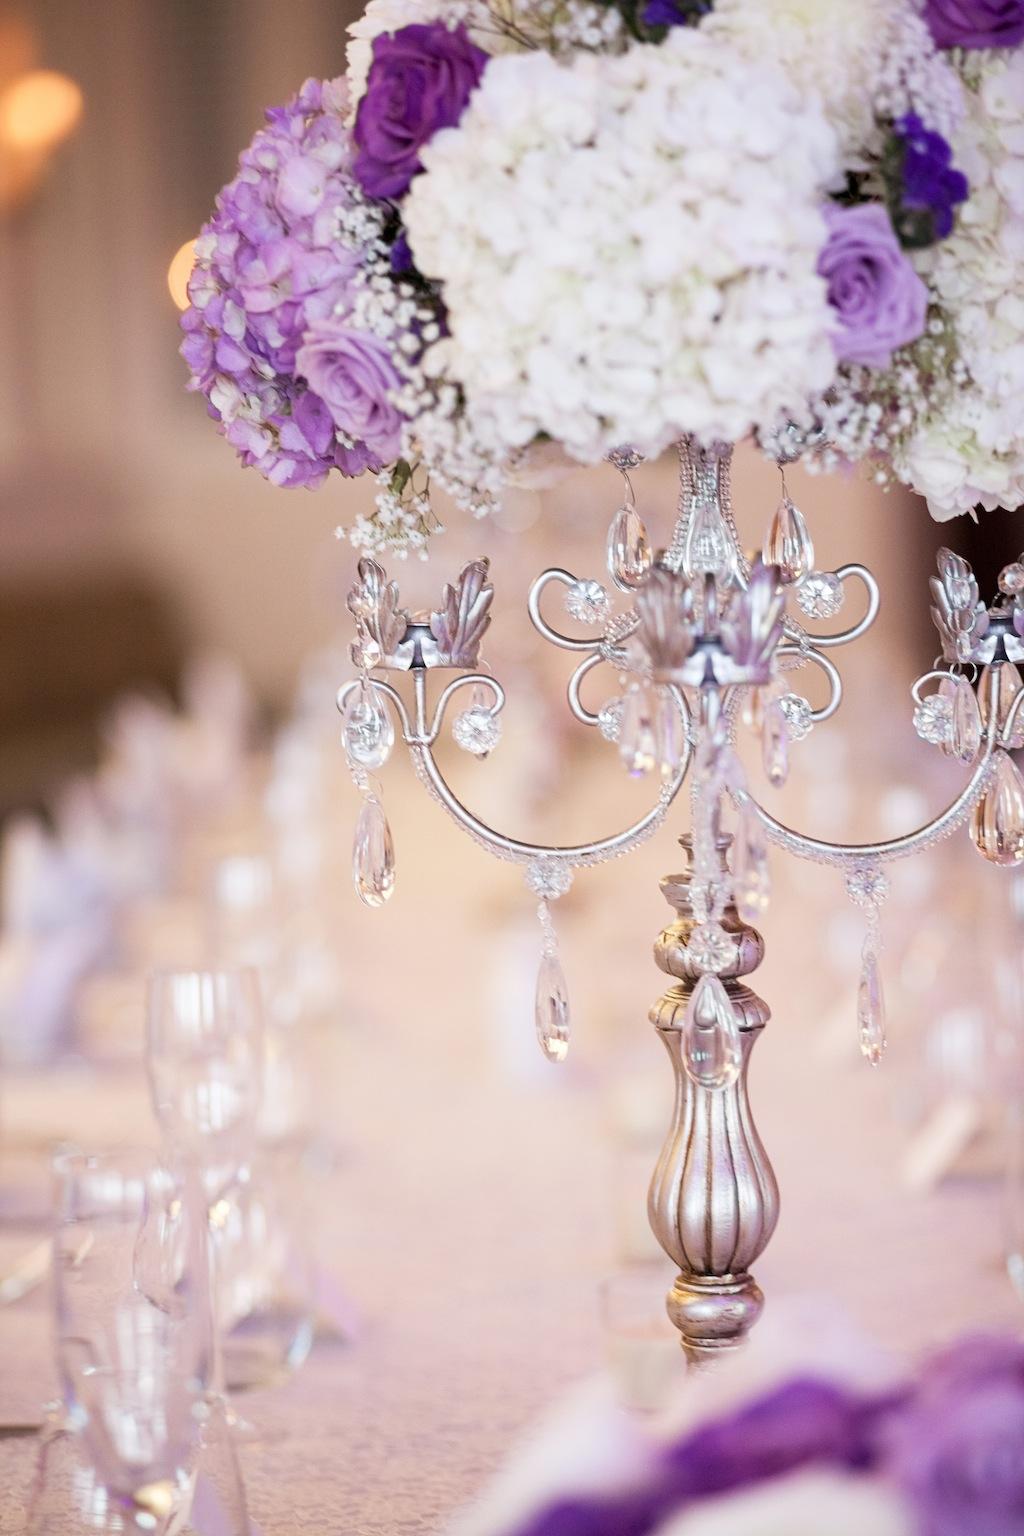 Brooksville Wedding - Purple, Silver & Ivory Wedding at Southern Hills Plantation Club - Brooksville Wedding Photographer Blue Lane Studios (54)